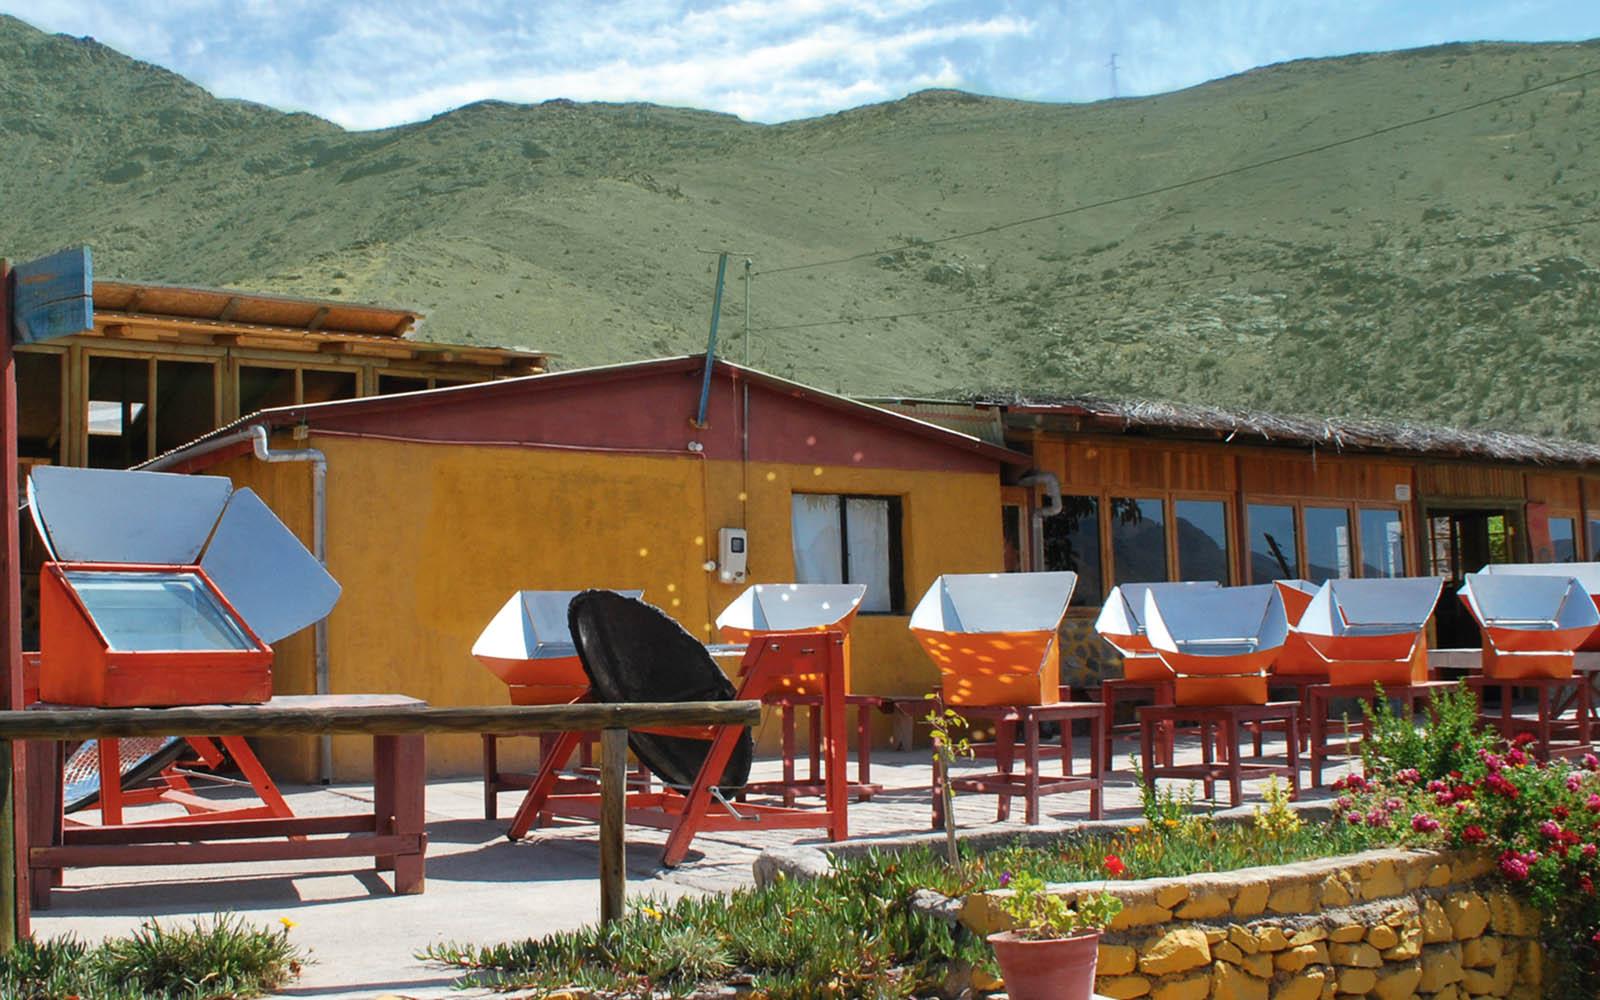 Ресторан Солар Вилласека в Чили